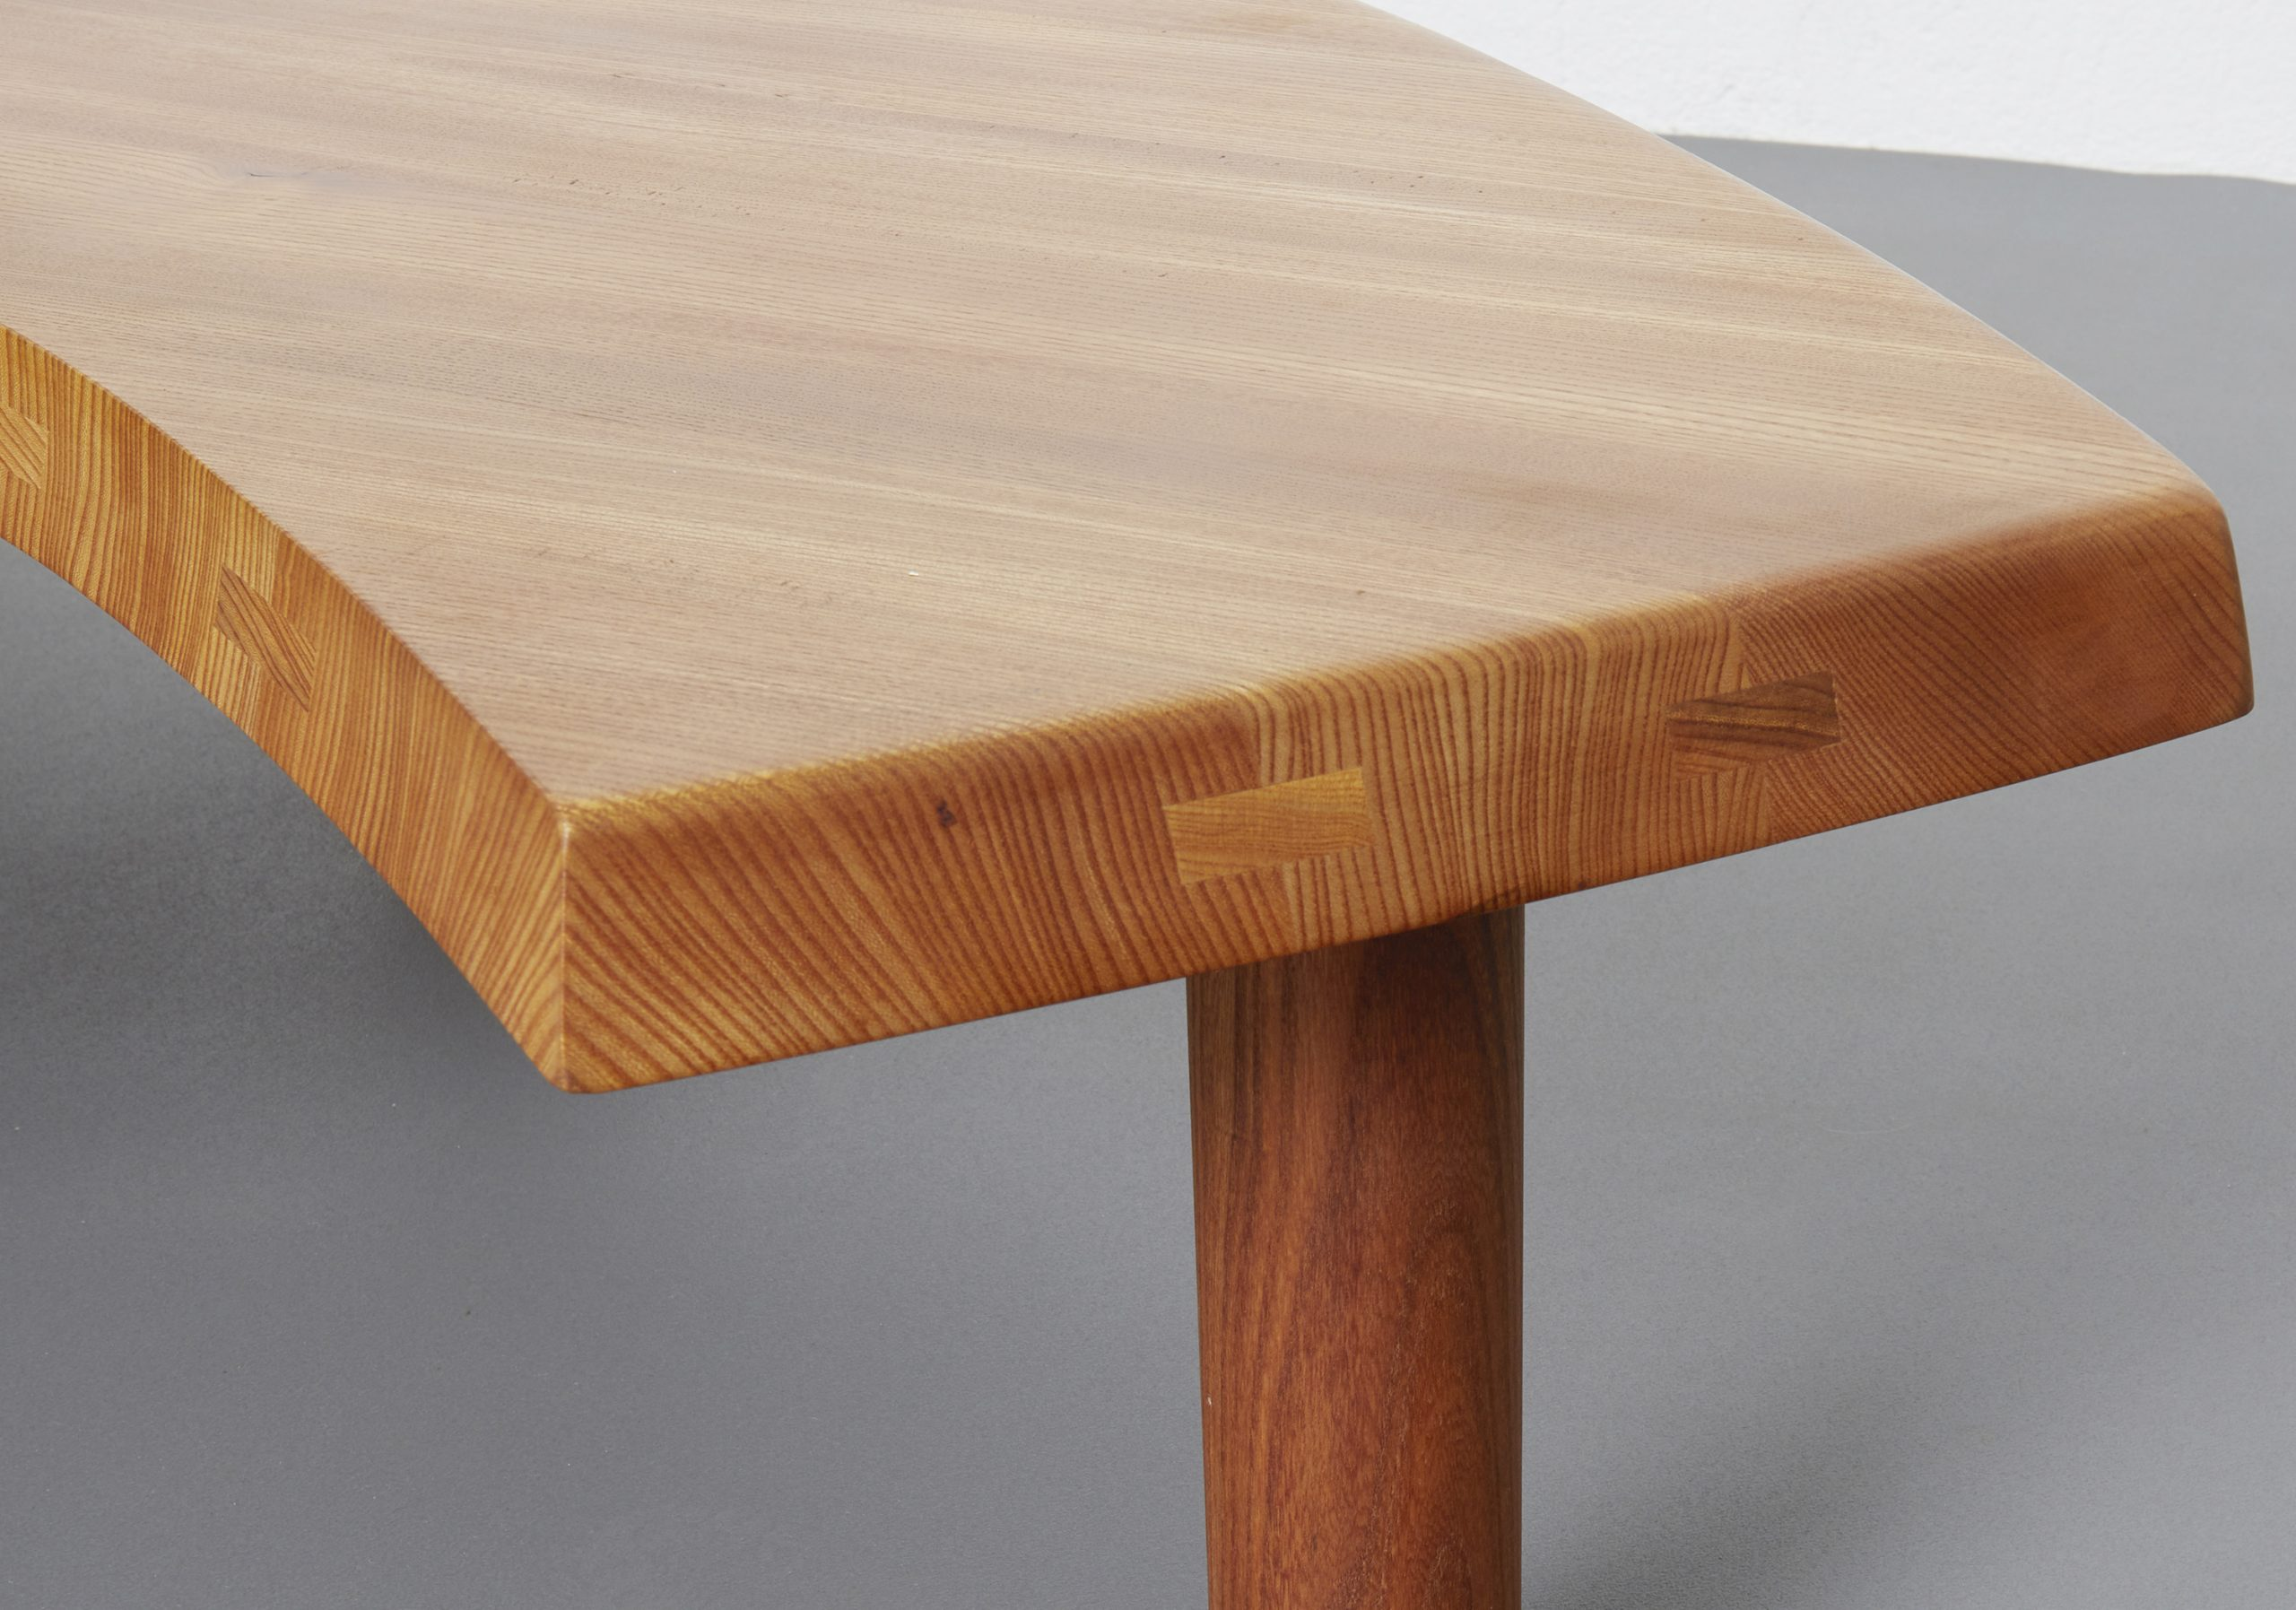 single-elmwood-low-table-t22-by-pierre-chapo-image-05